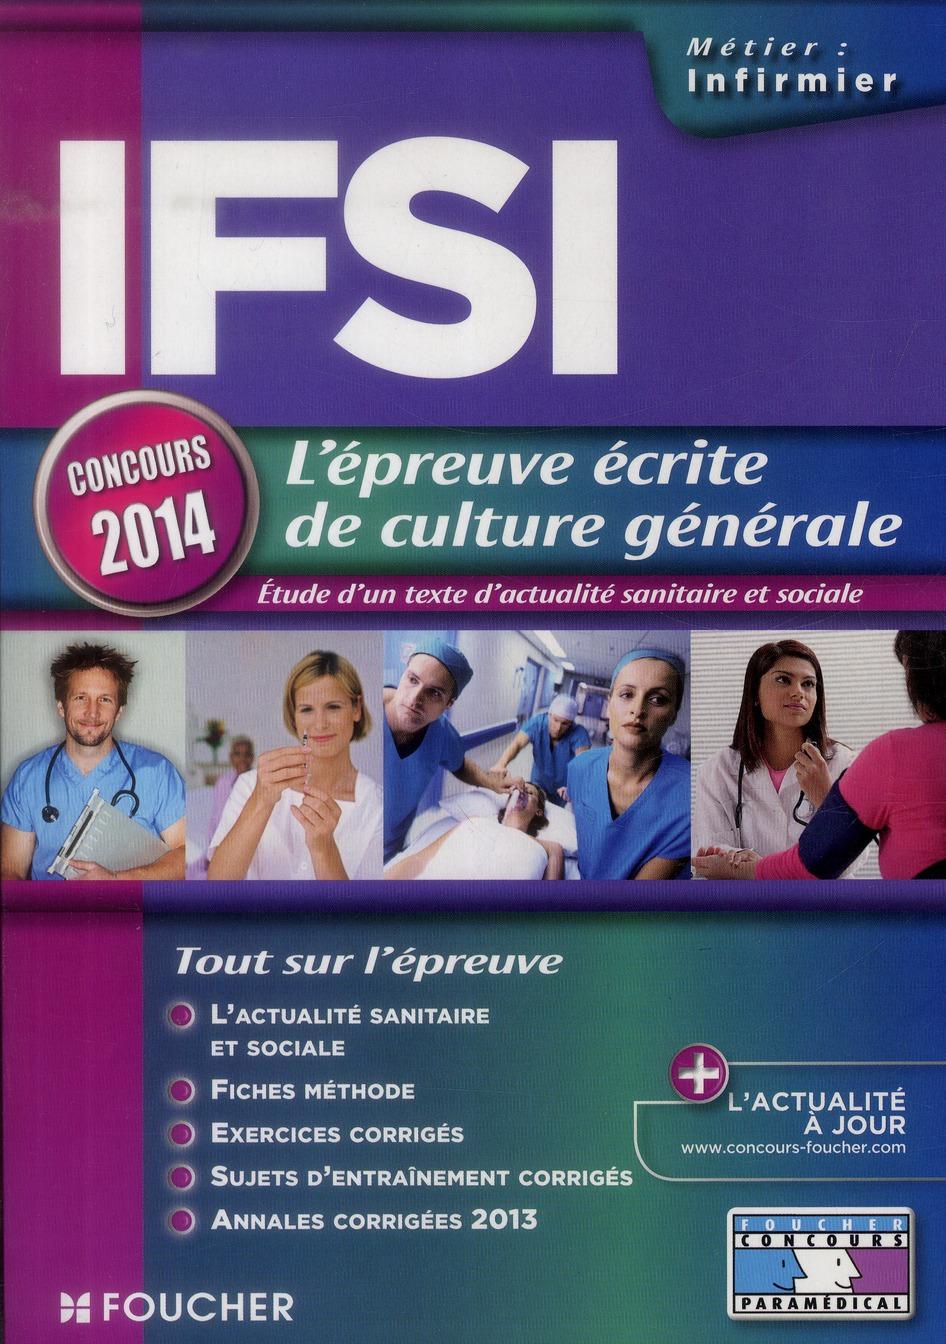 Ifsi ; L'Epreuve Ecrite De Culture Generale ; Concours 2014